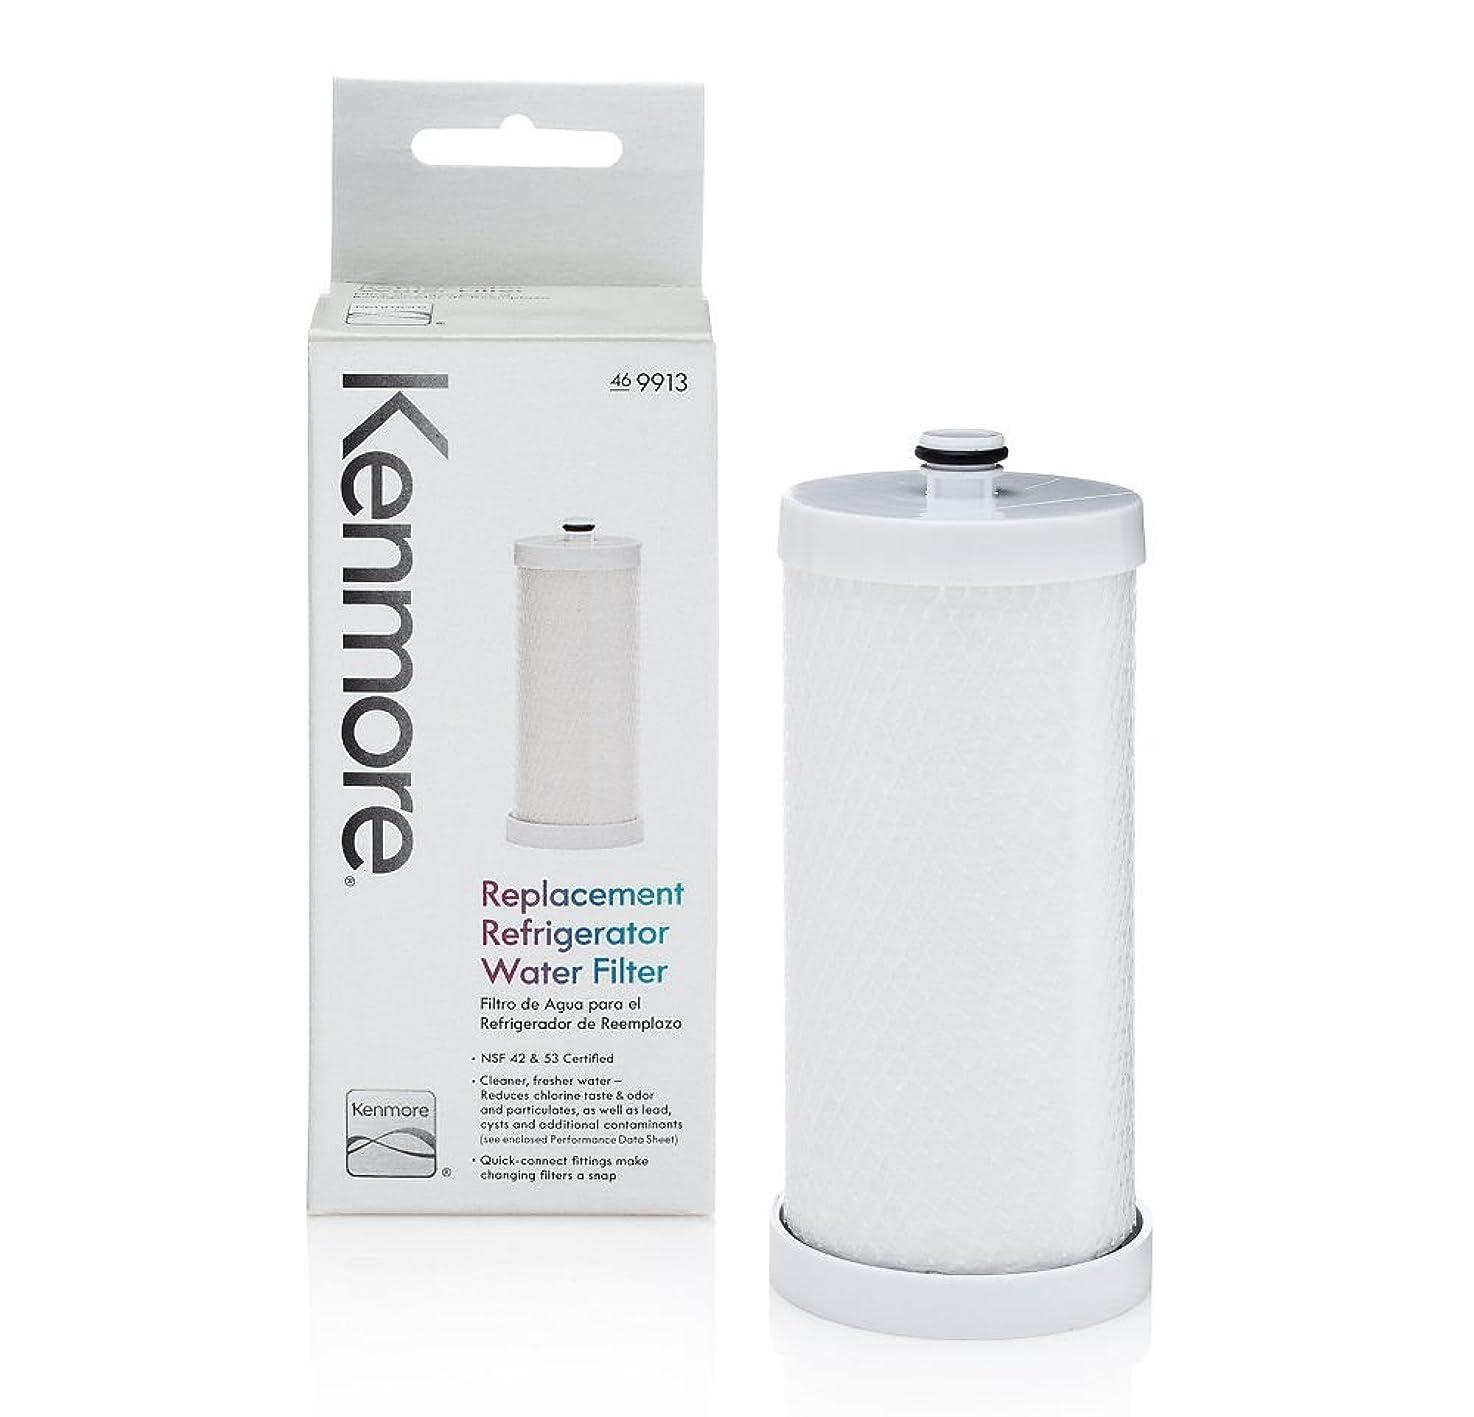 Kenmore 9913 Genuine Kenmore Refrigerator Water Filter for FRIGIDAIRE,CROSLEY,WHITE-WESTINGHOUSE,GIBSON,KENMORE Genuine Original Equipment Manufacturer (OEM) part cwbvooinfbejc7